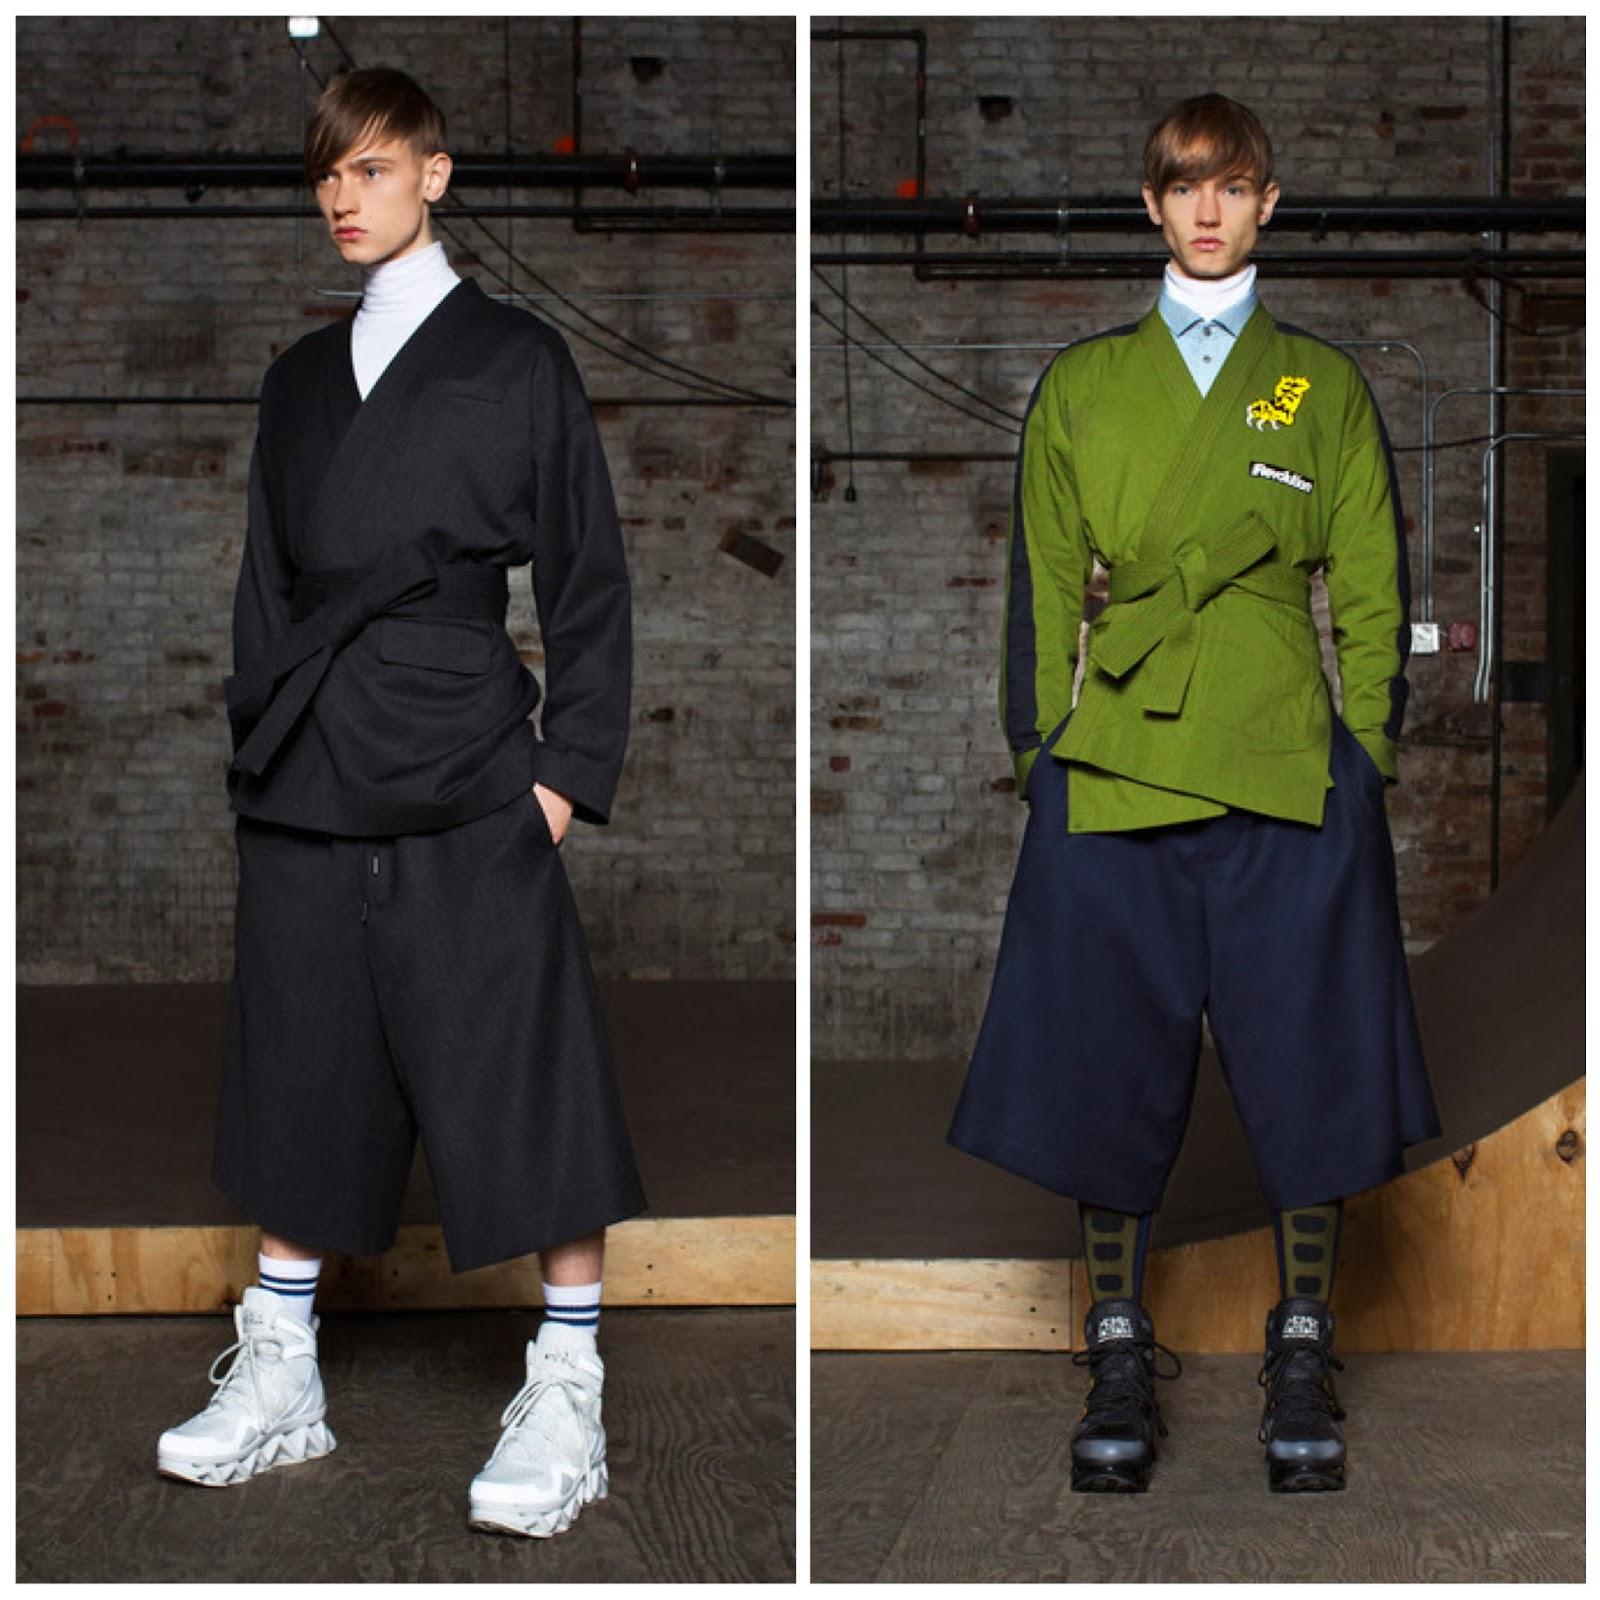 mybelonging-marcjacobs-fw14-menswear-collection-nyfw.jpg